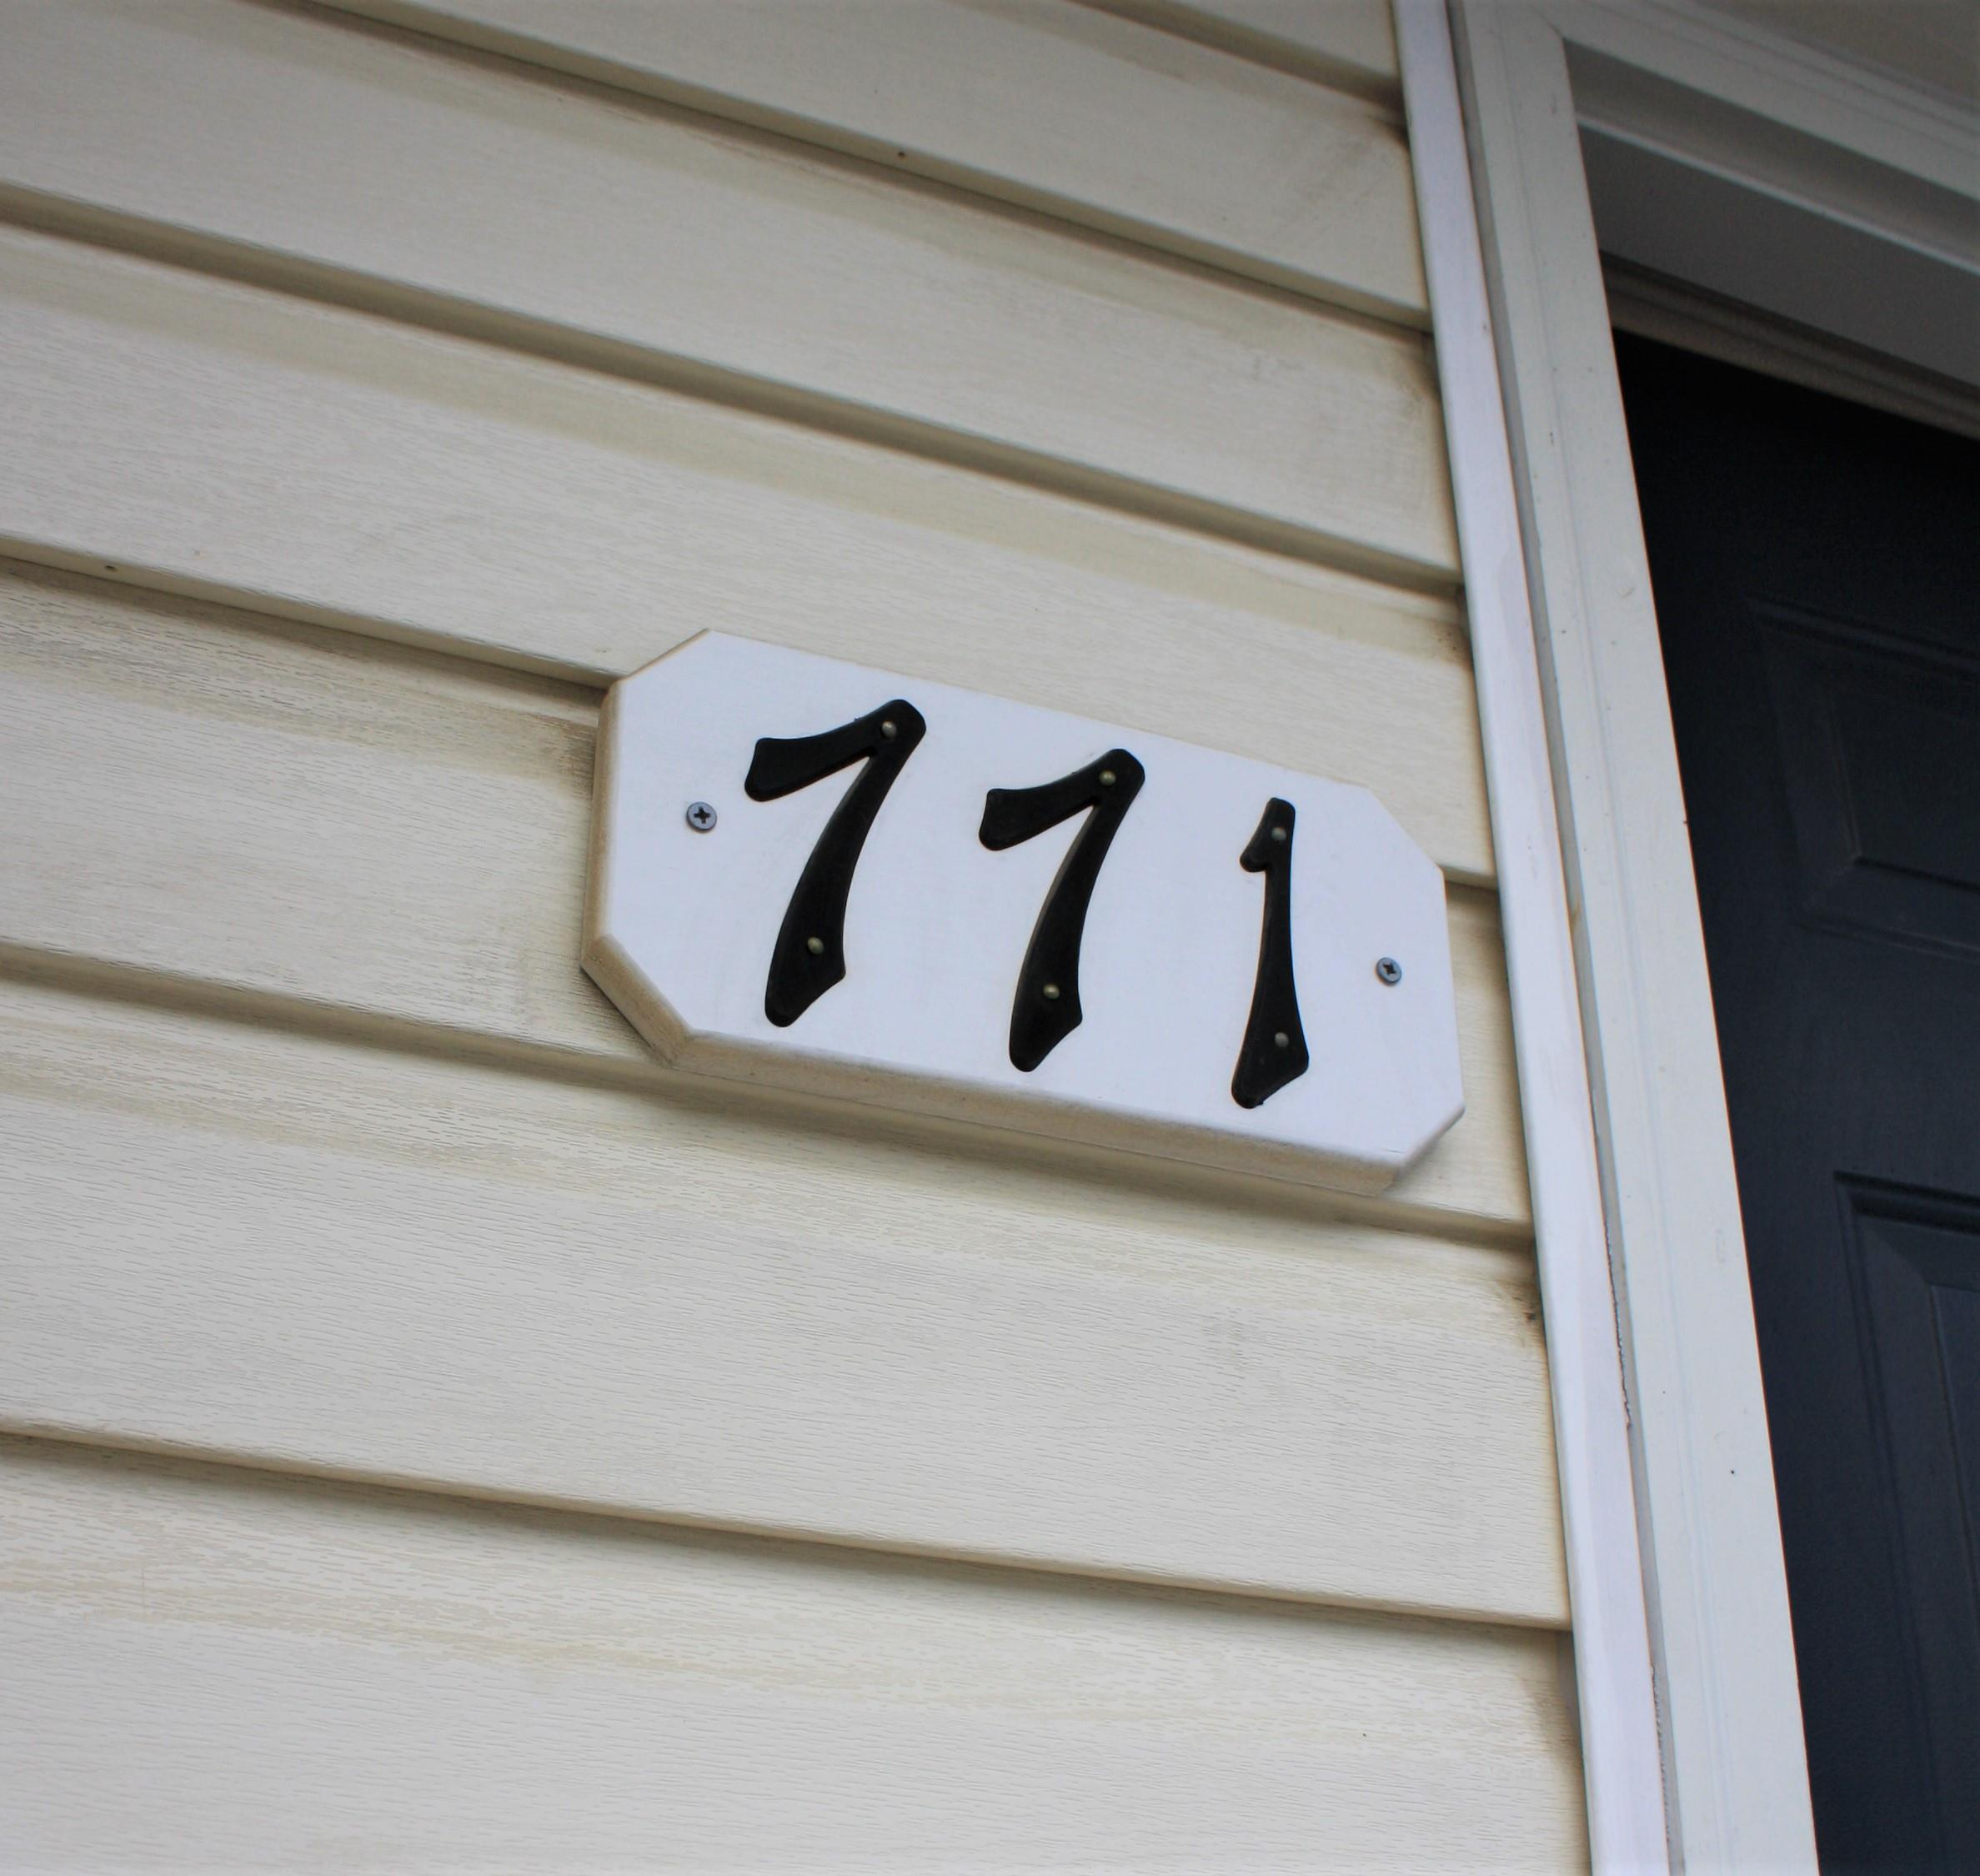 771 Avalon Woods